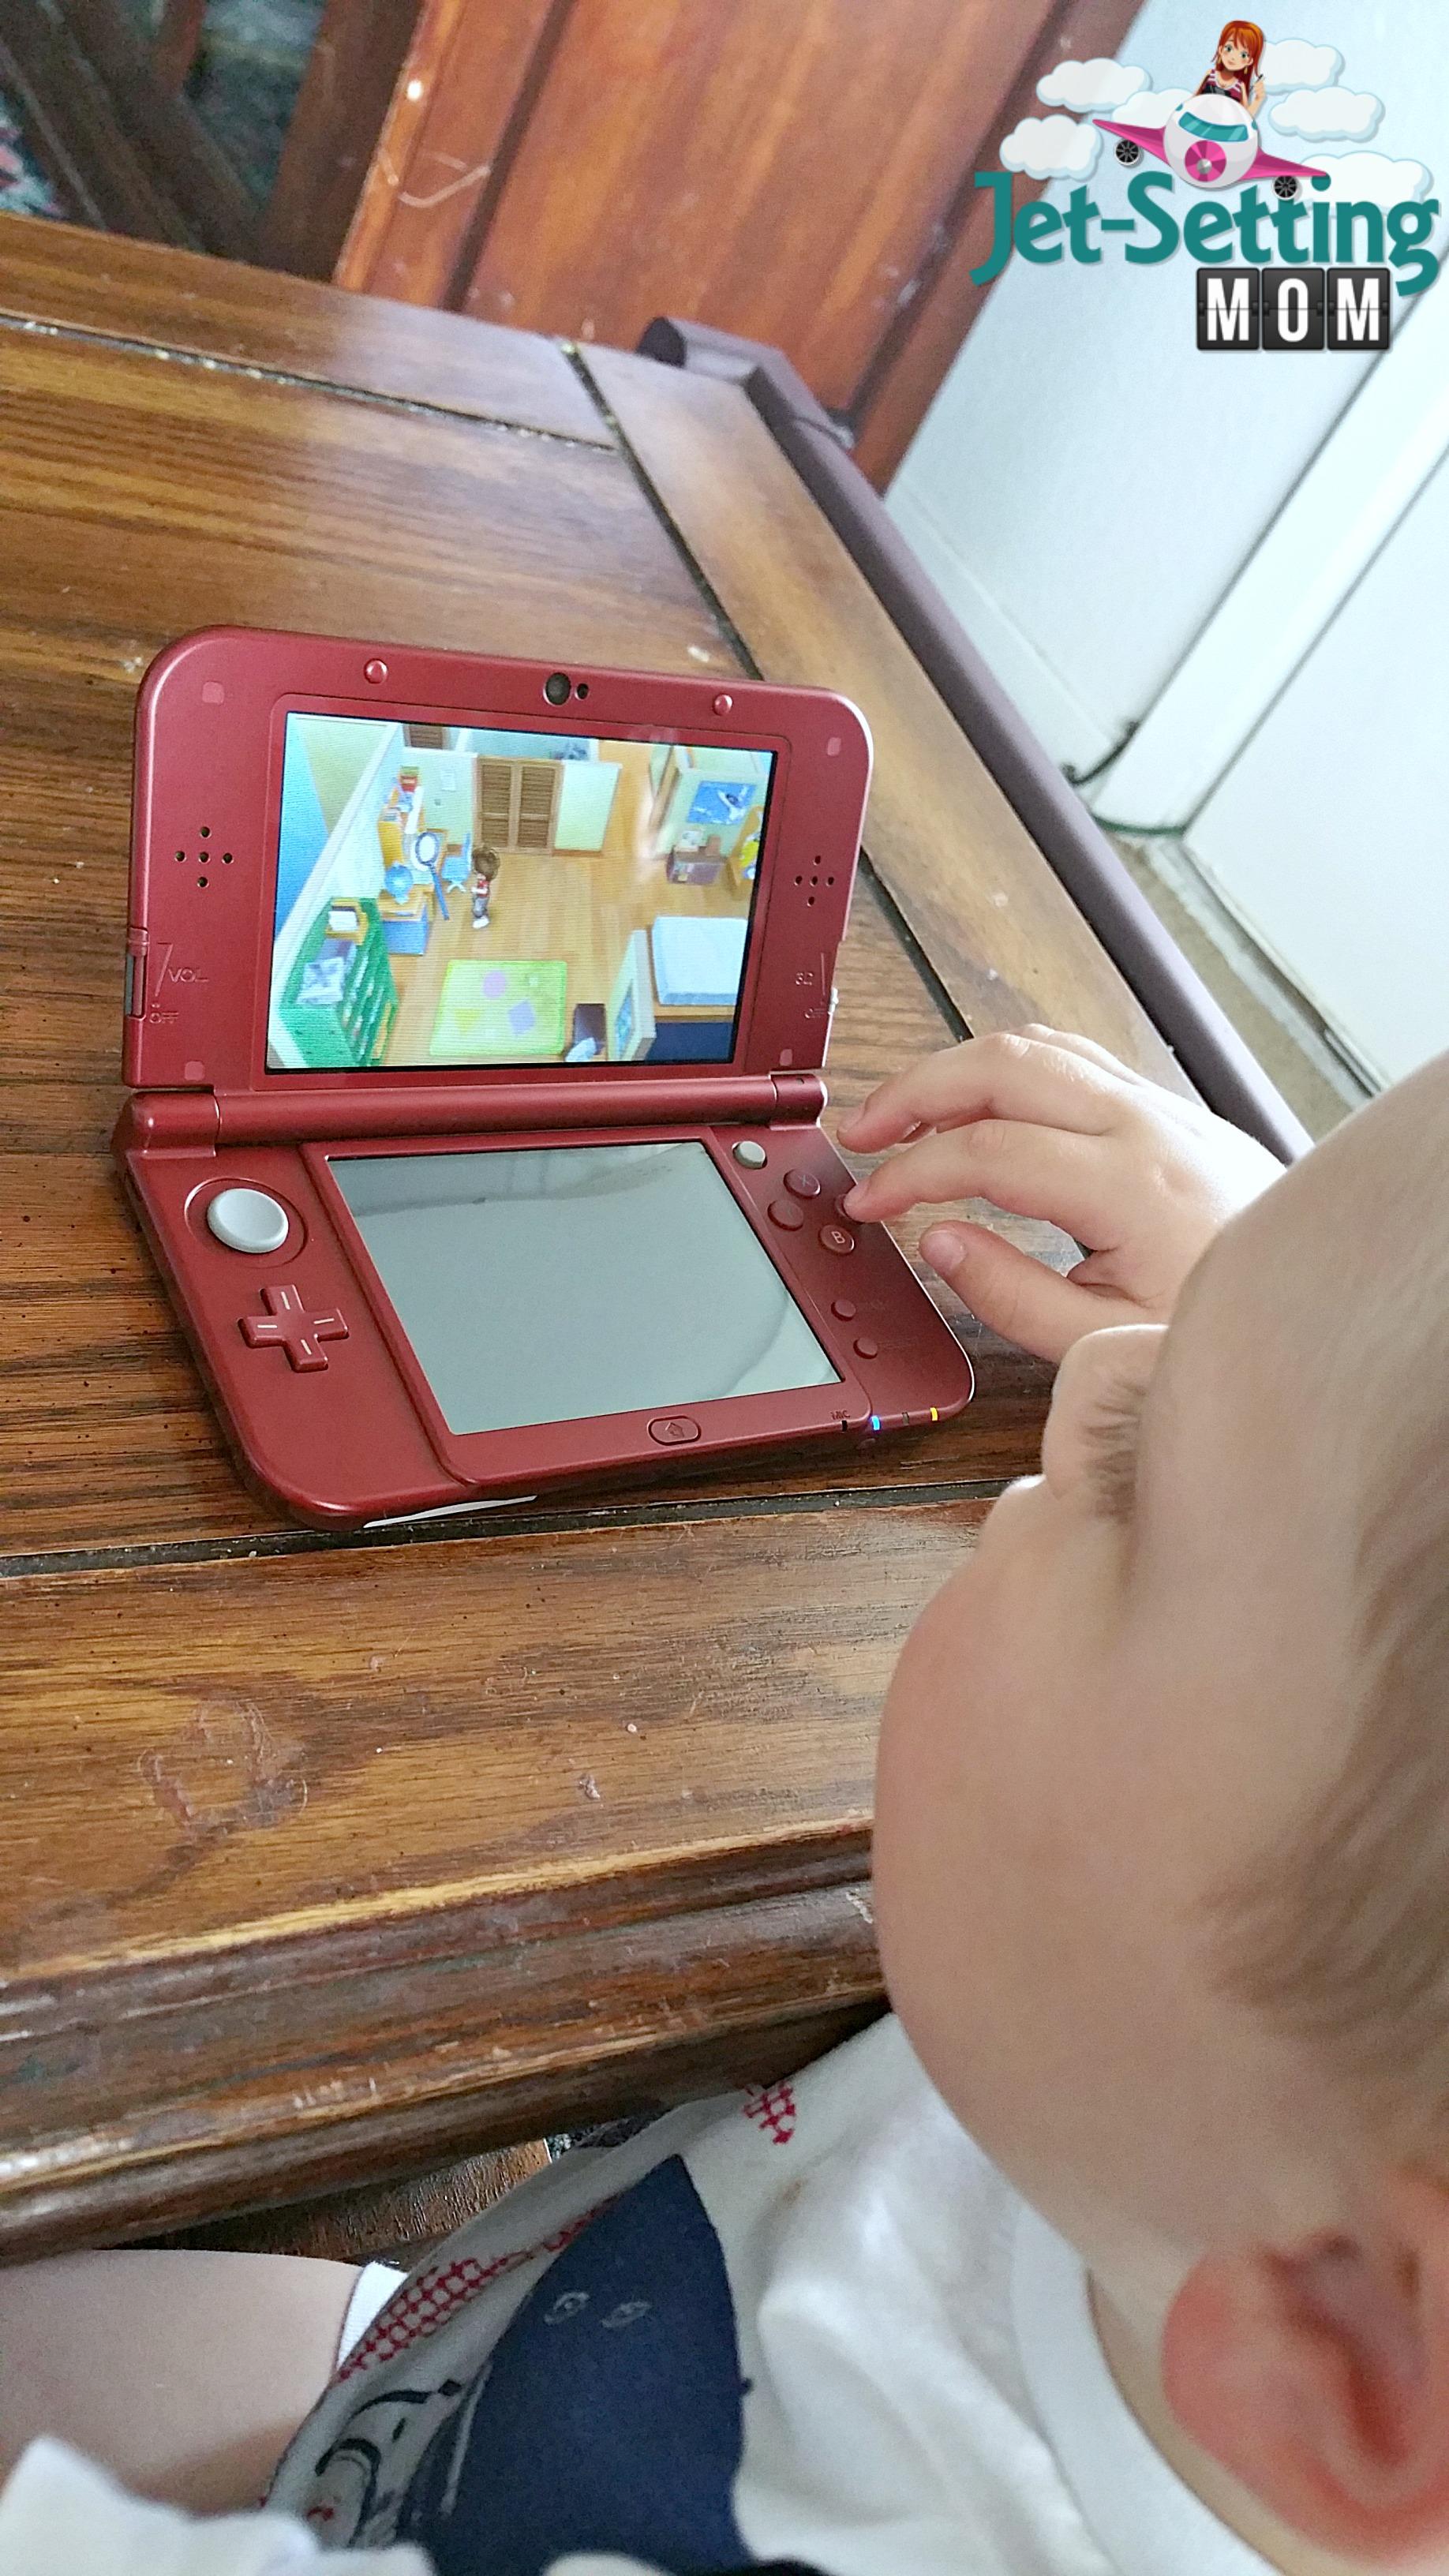 Nintendo Yo-Kai Watch game is a favorite with my kids!